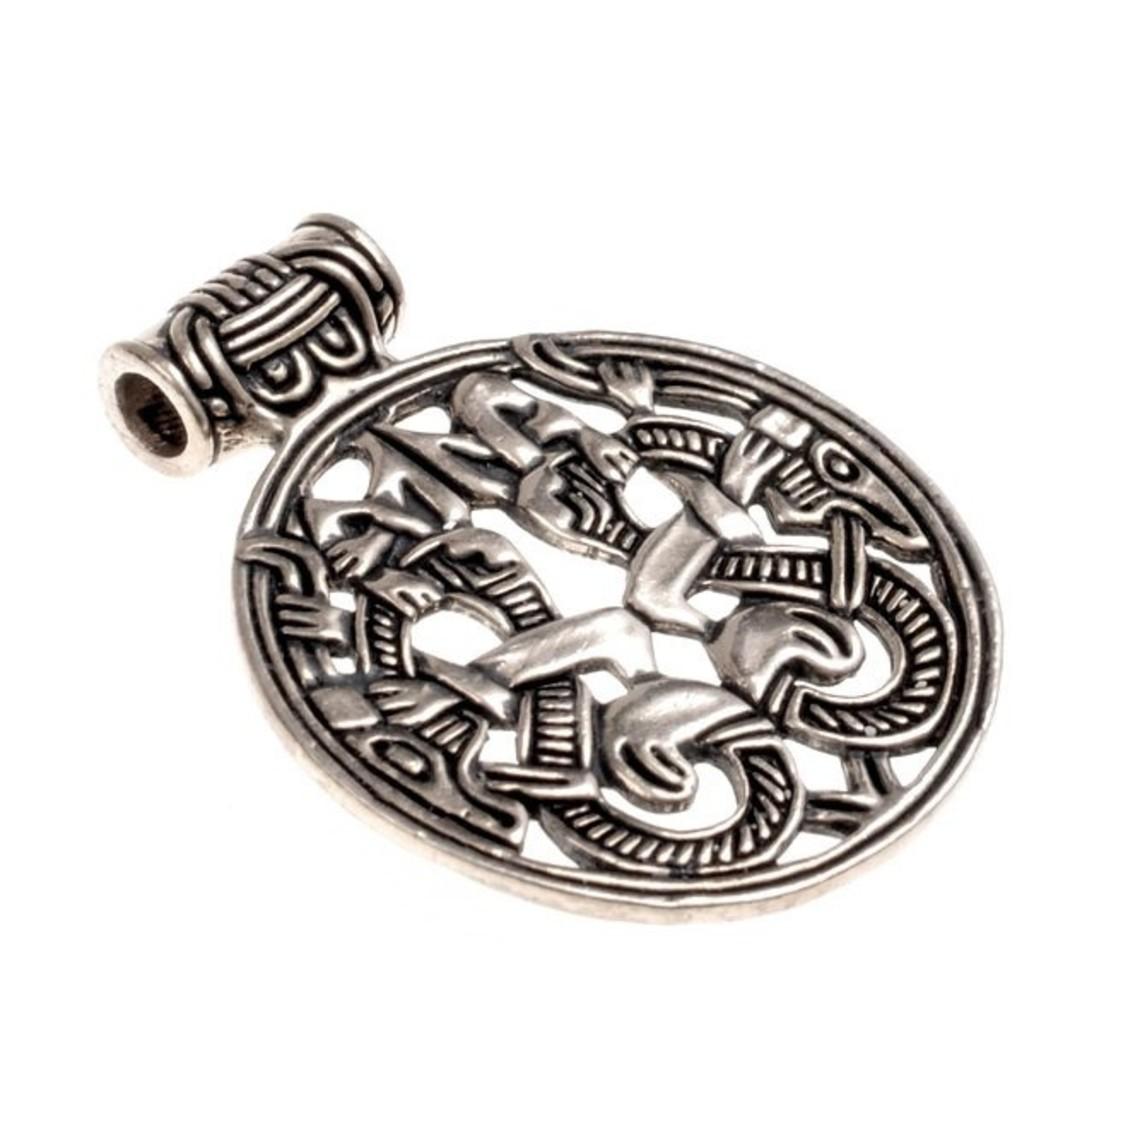 Varby Jellinge juvel, försilvrade brons